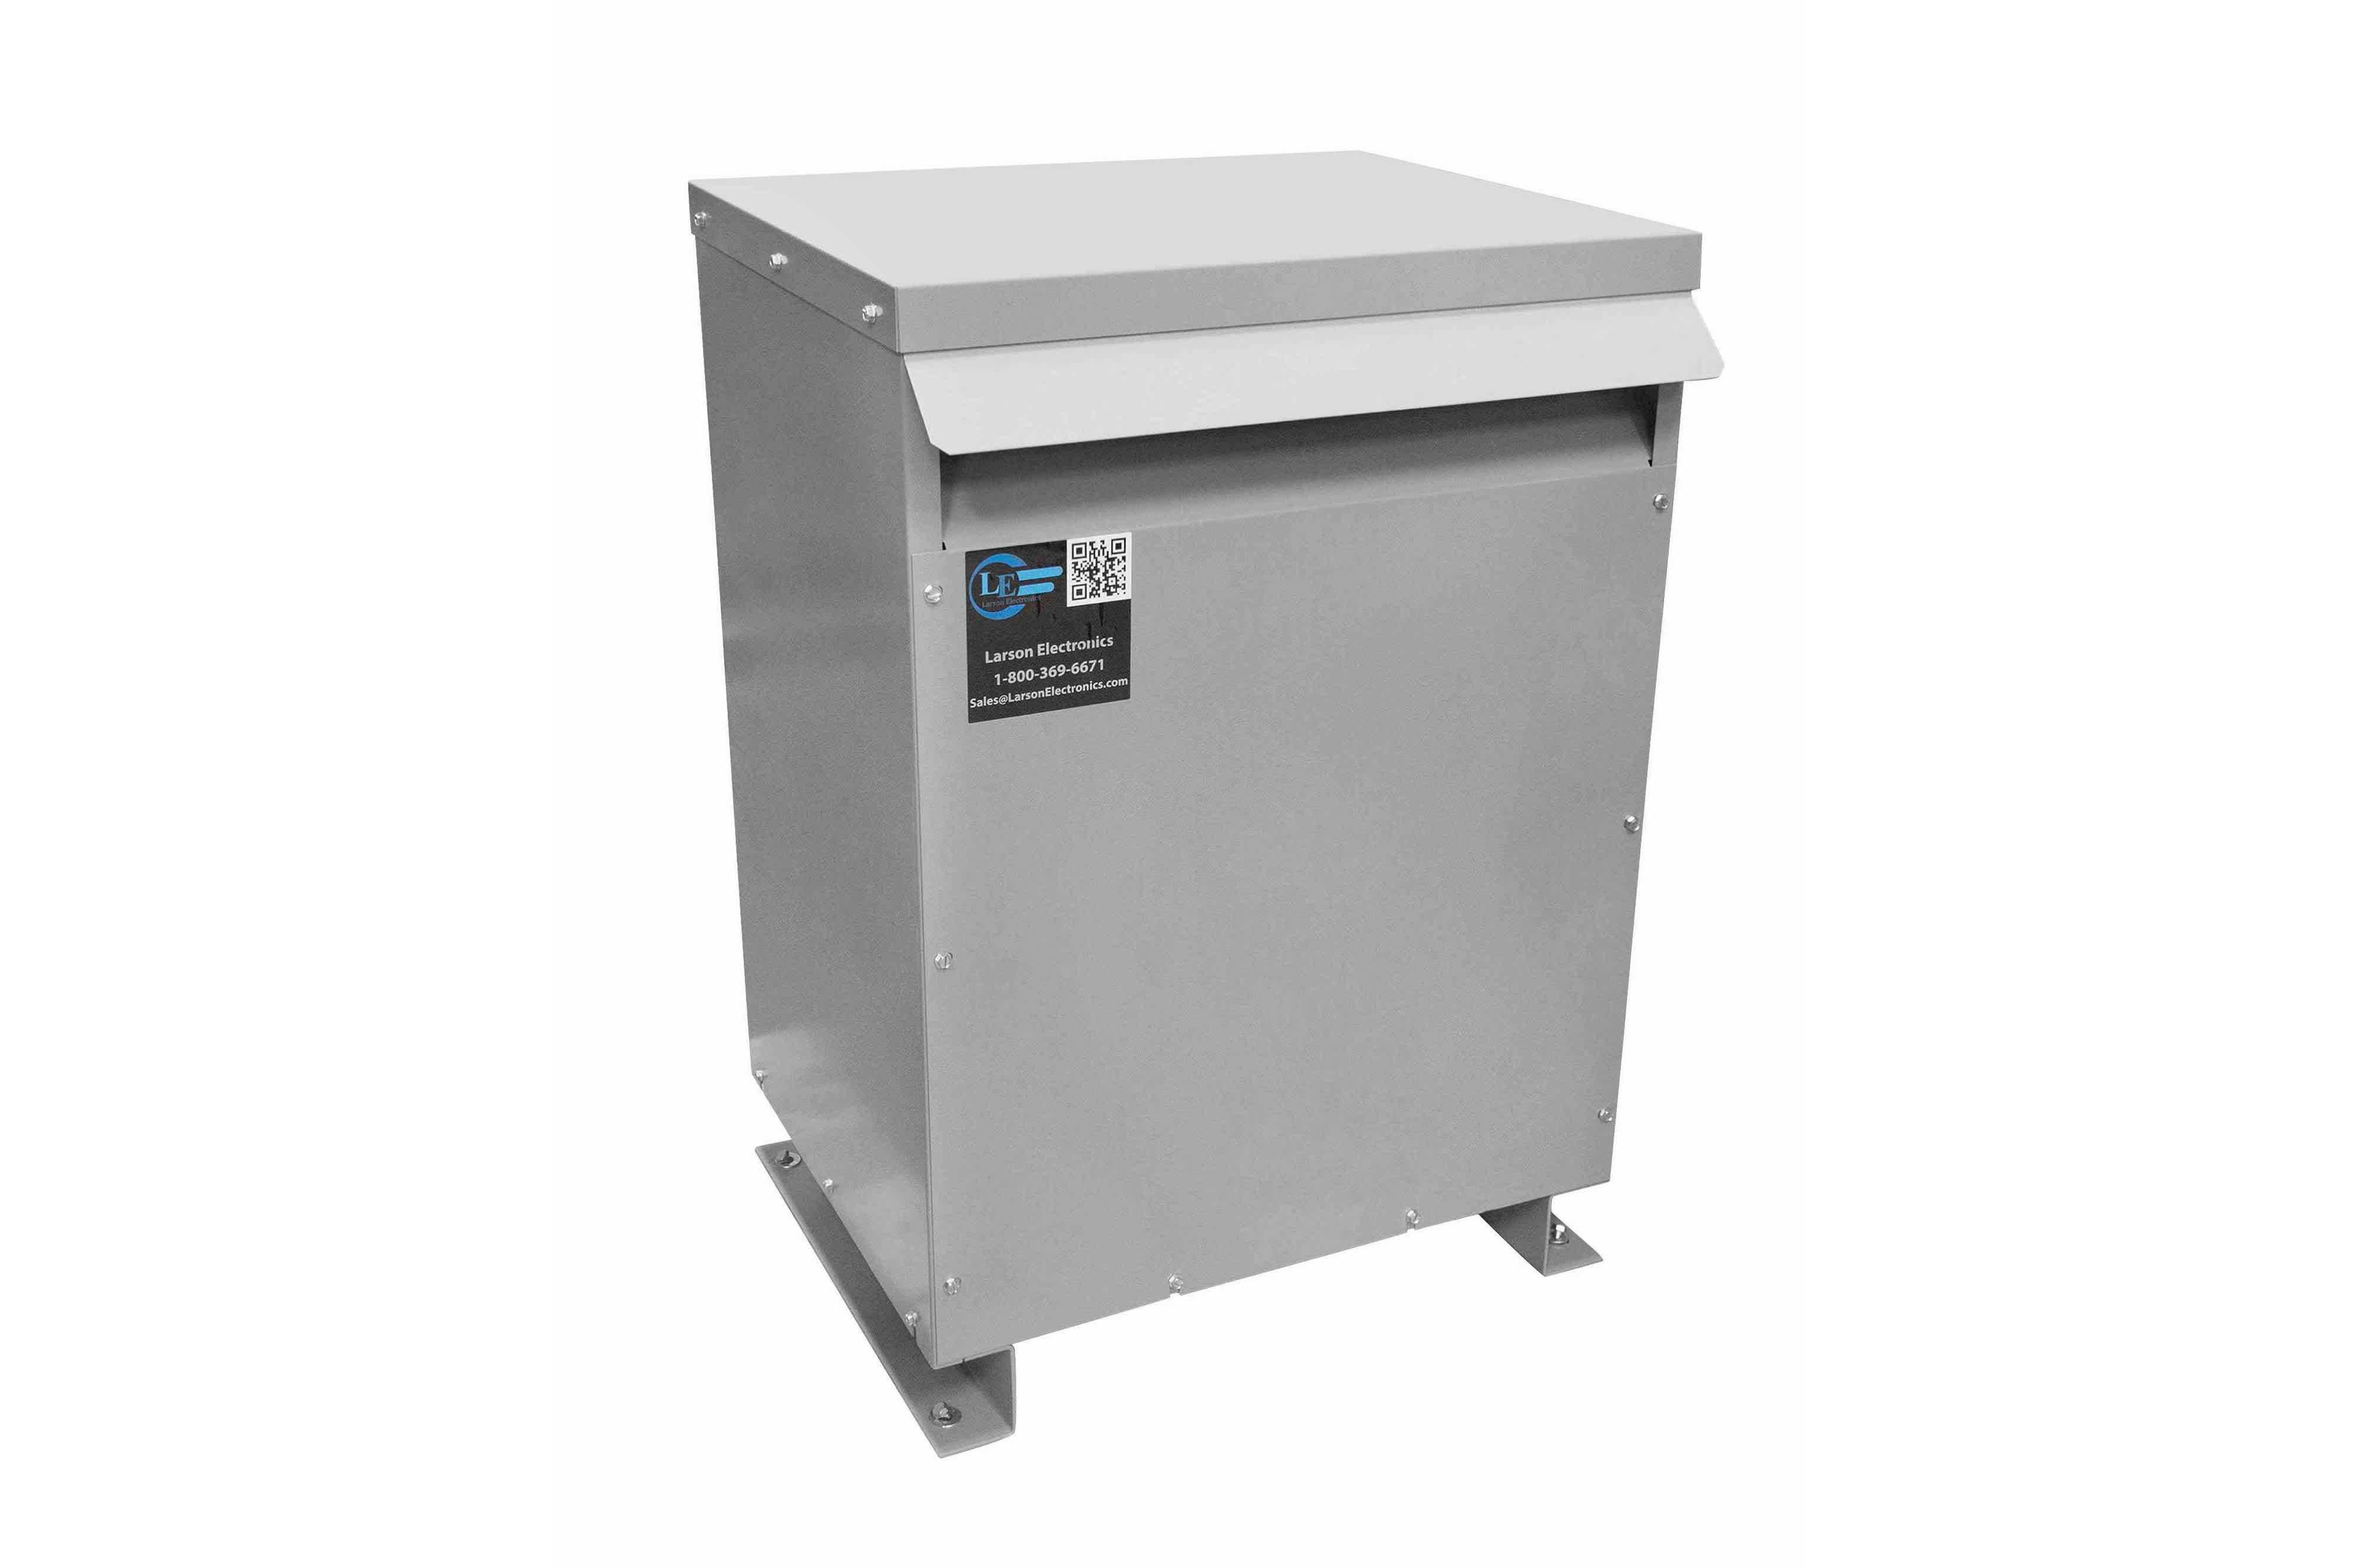 175 kVA 3PH Isolation Transformer, 380V Wye Primary, 208Y/120 Wye-N Secondary, N3R, Ventilated, 60 Hz